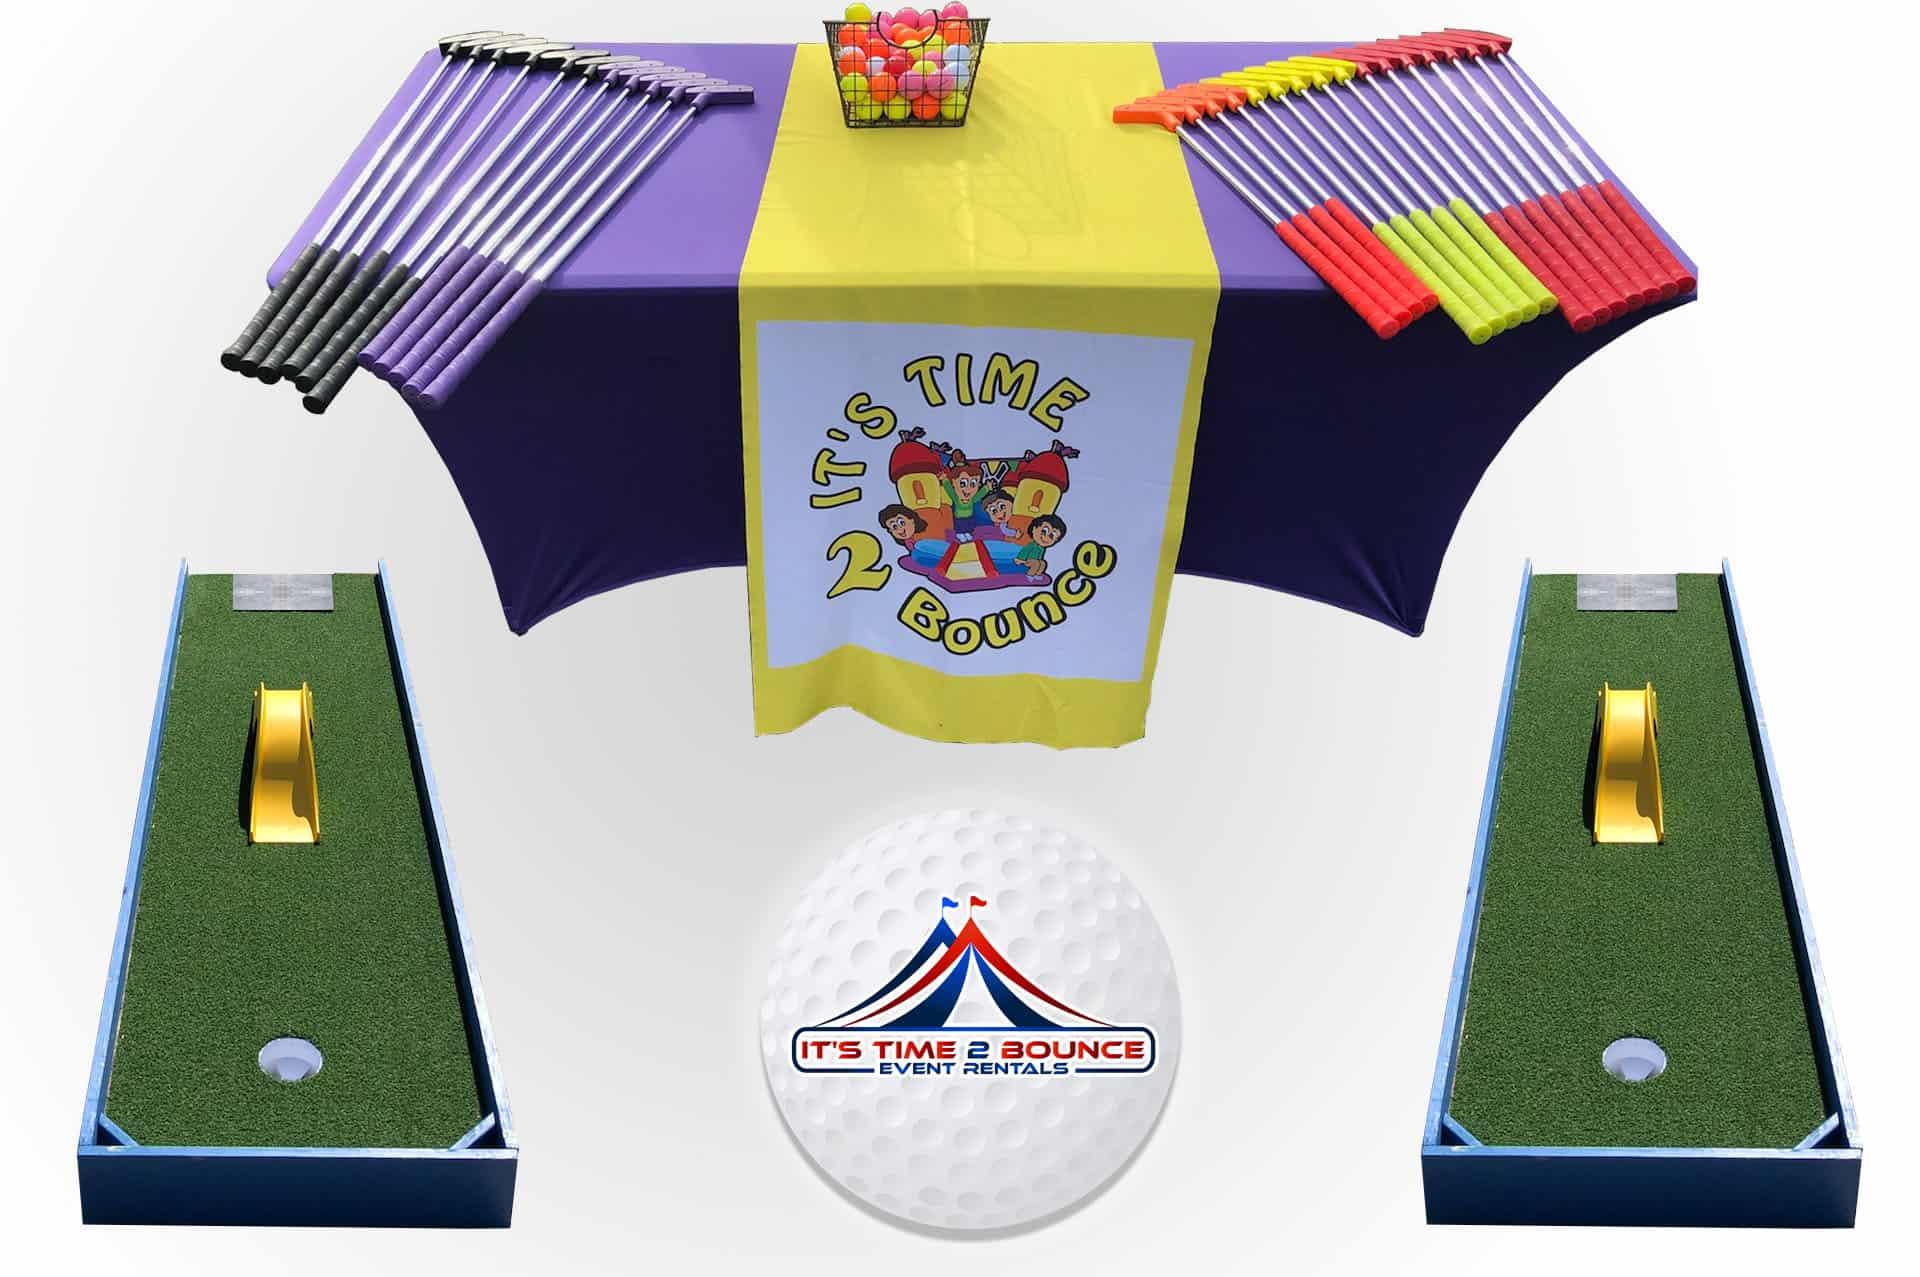 Portable Mini Golf Rentals Nashville TN